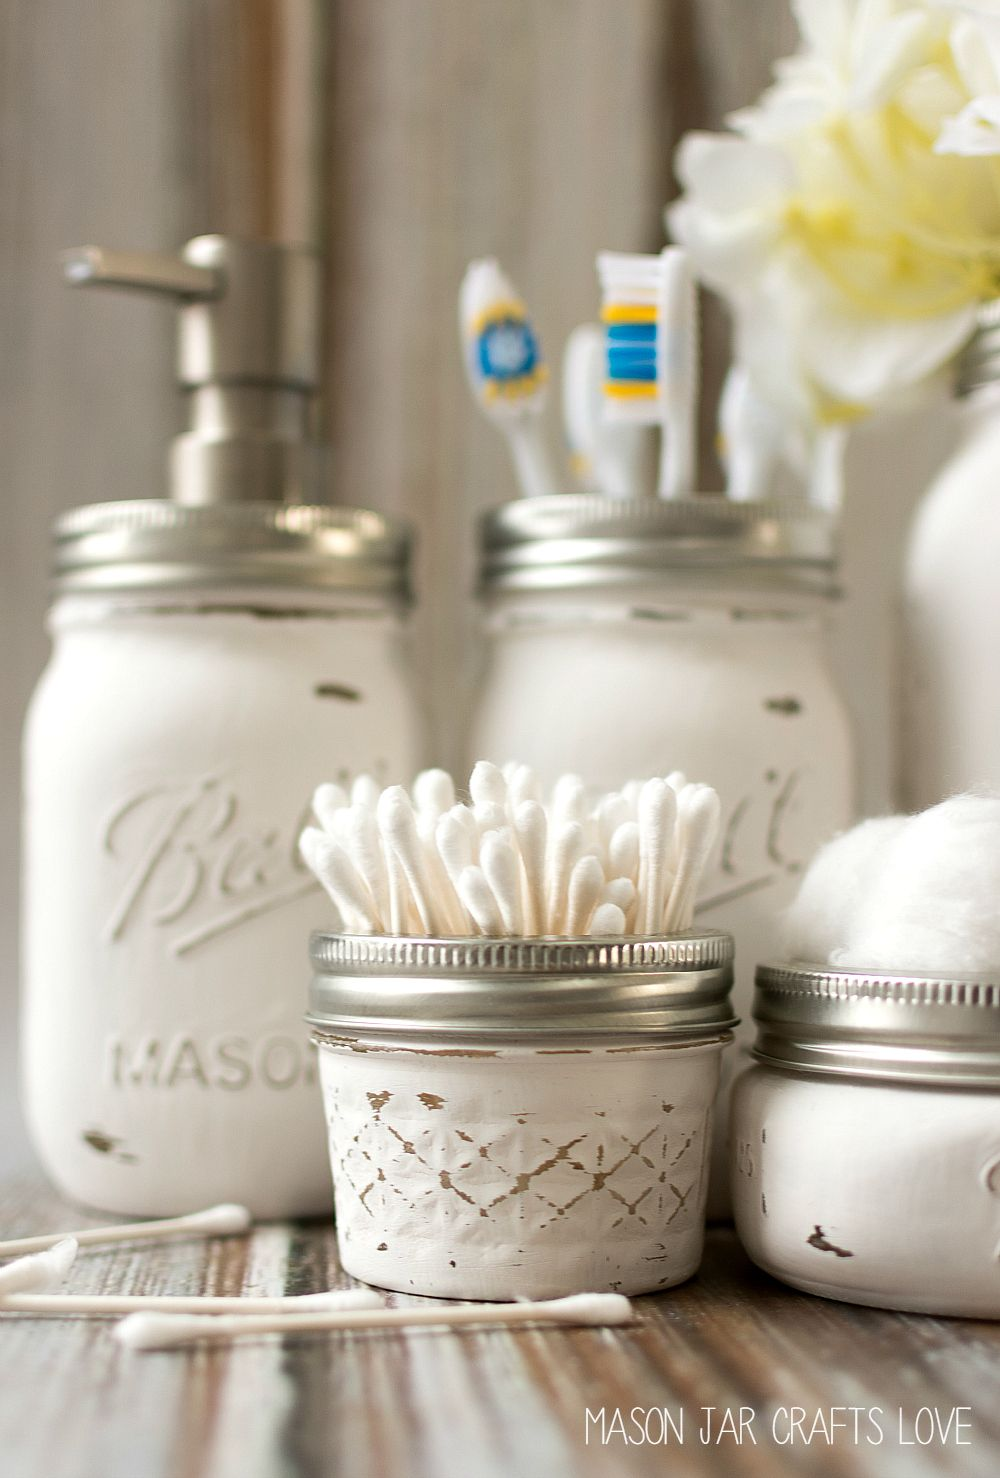 Mason Jar Bathroom Storage Accessories Mason Jar Crafts Love